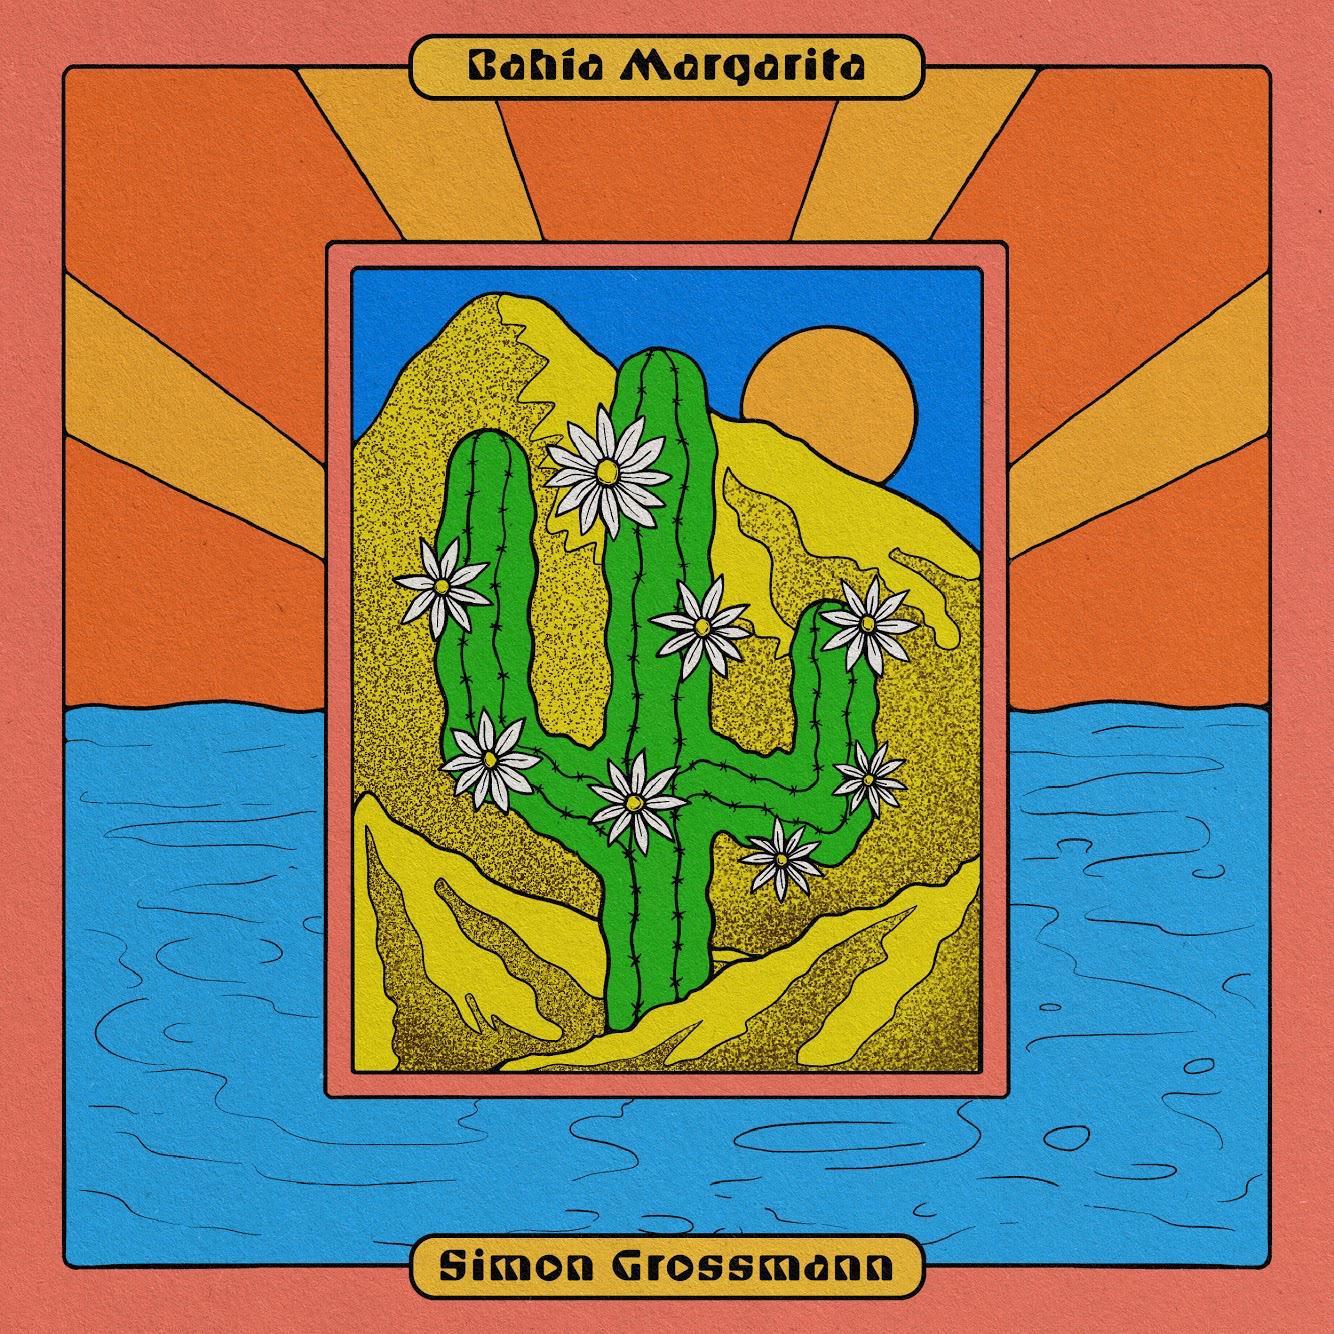 Simon Grossmann lanza su nuevo álbum, Bahía Margarita